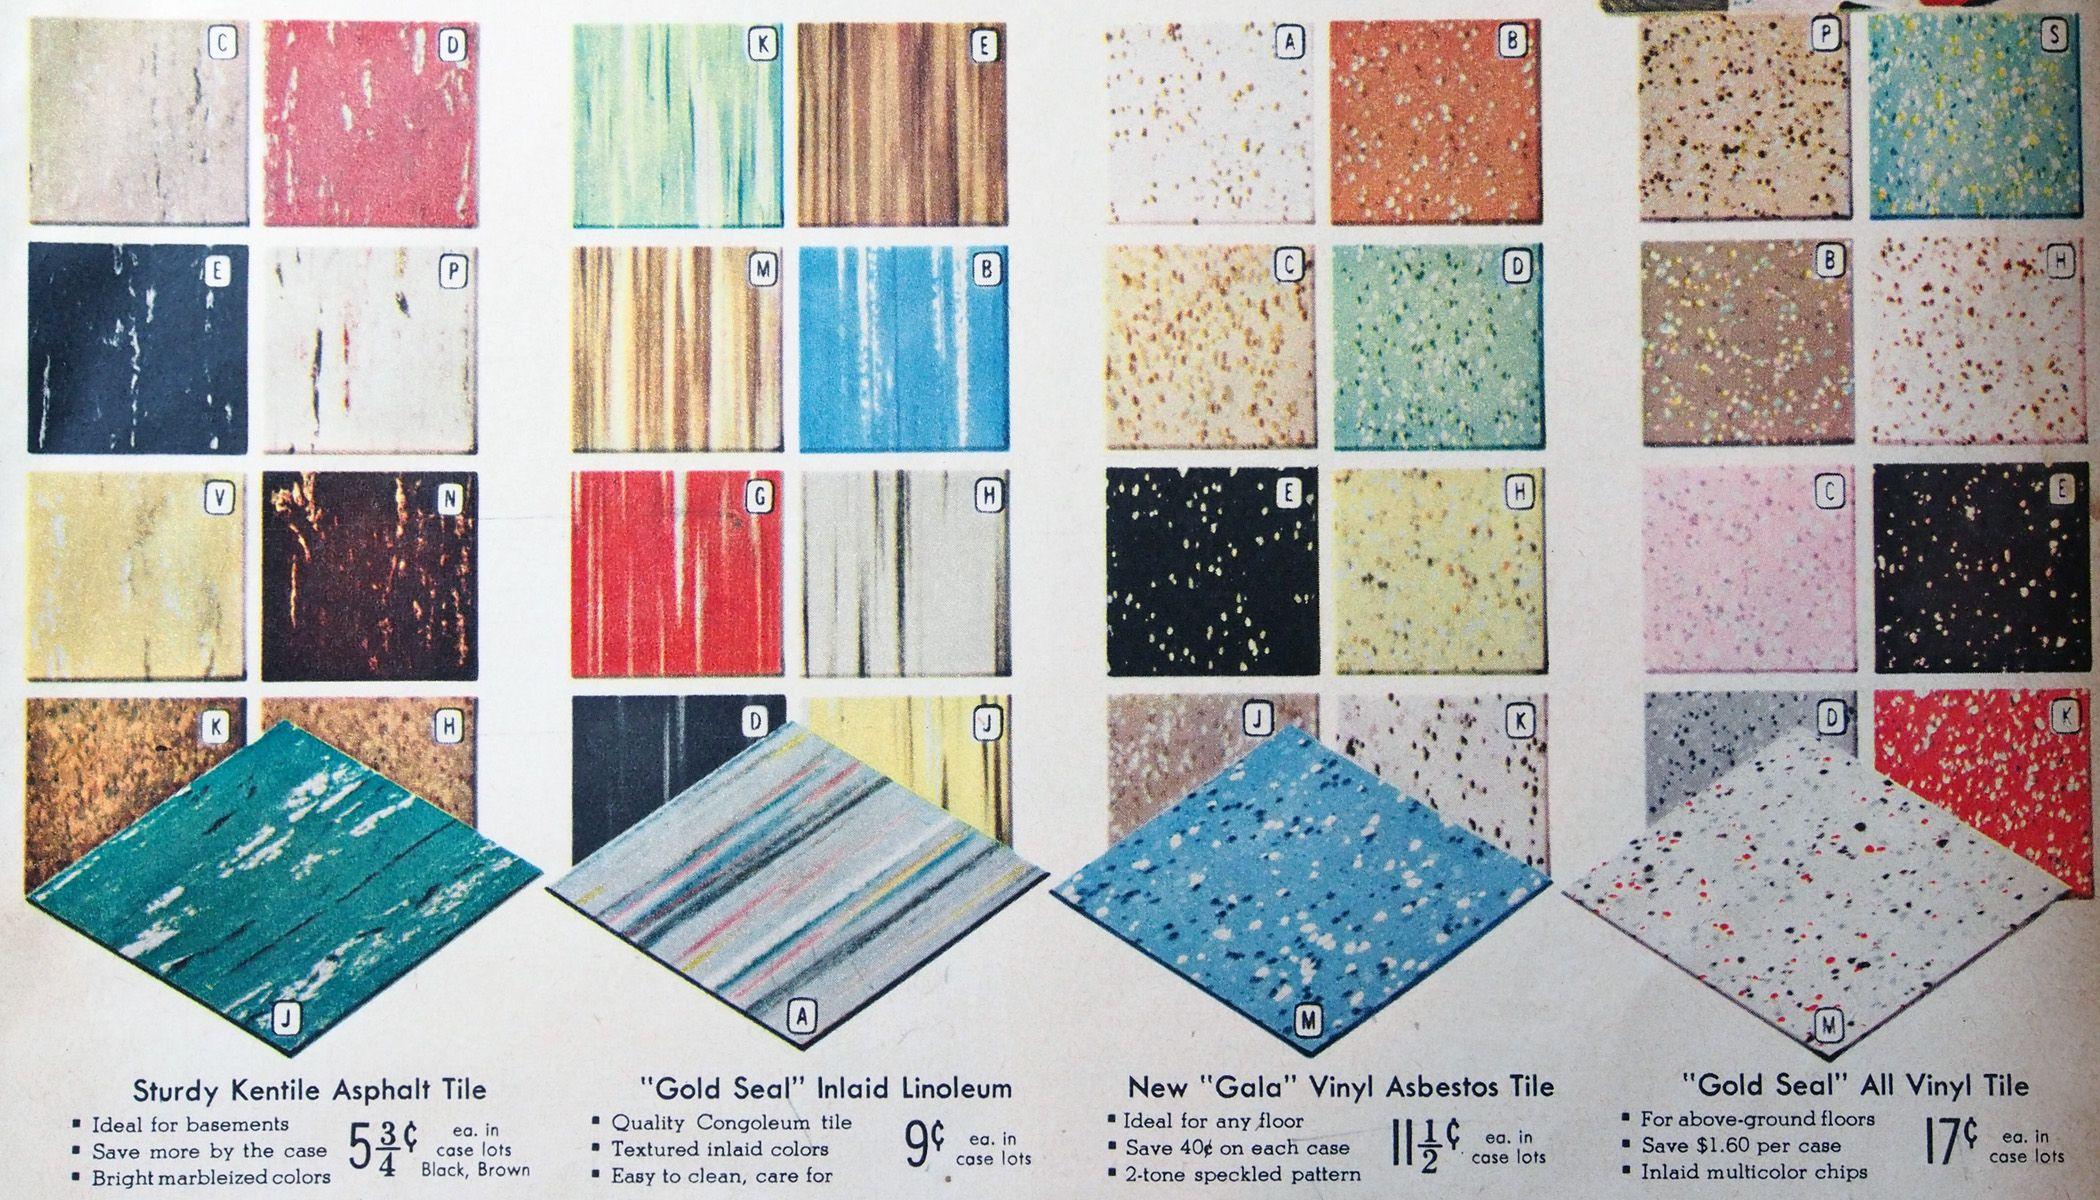 Vintage Indoor Photos Early Fifties Google Search Vintage Floor Cushioned Vinyl Flooring Asbestos Tile